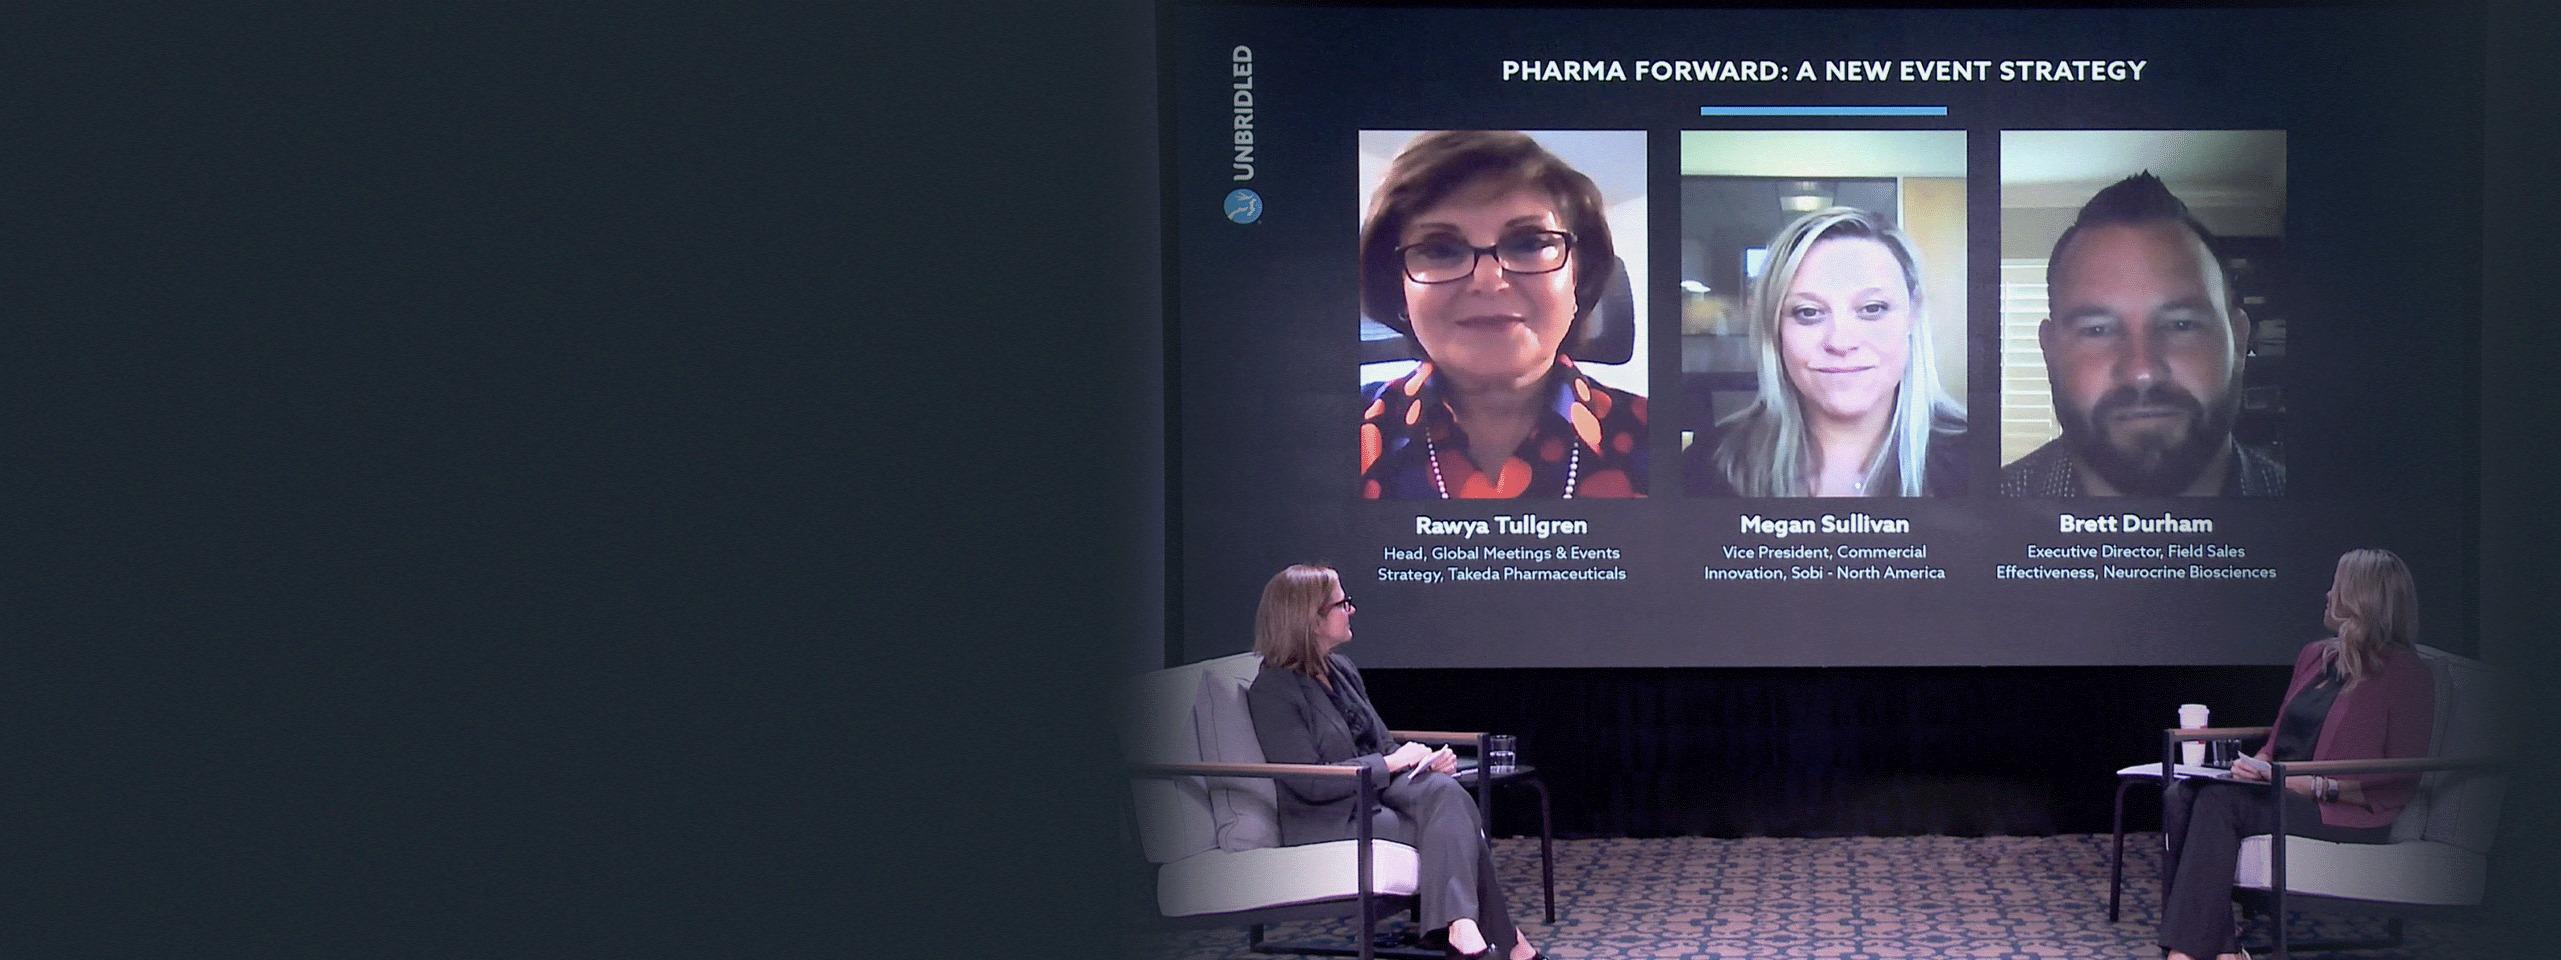 Pharma forward: A new event strategy